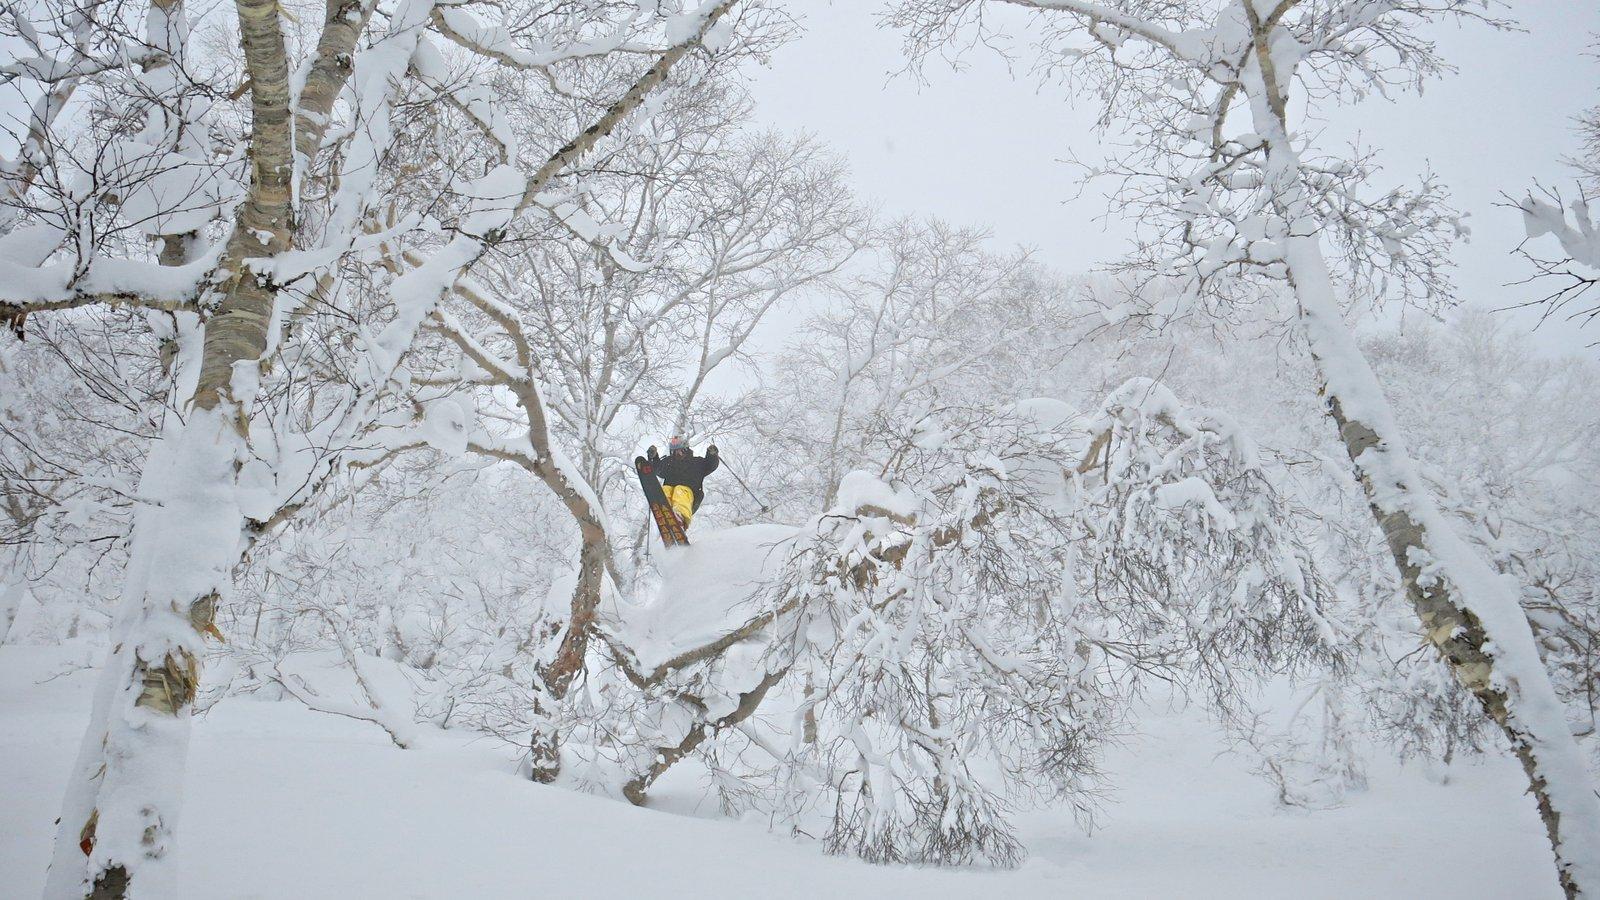 Tree Jibbin in Japan